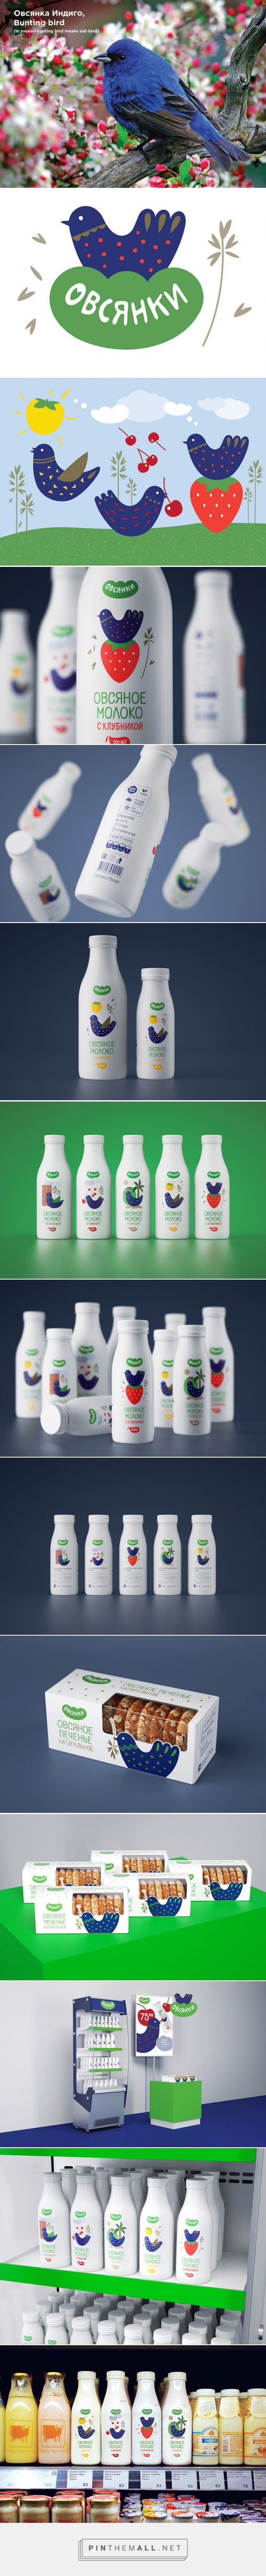 Oatbirds - oat milk student concept packaging designed by Daria Zhuchkova - http://www.packagingoftheworld.com/2015/07/oatbirds-student-project.html